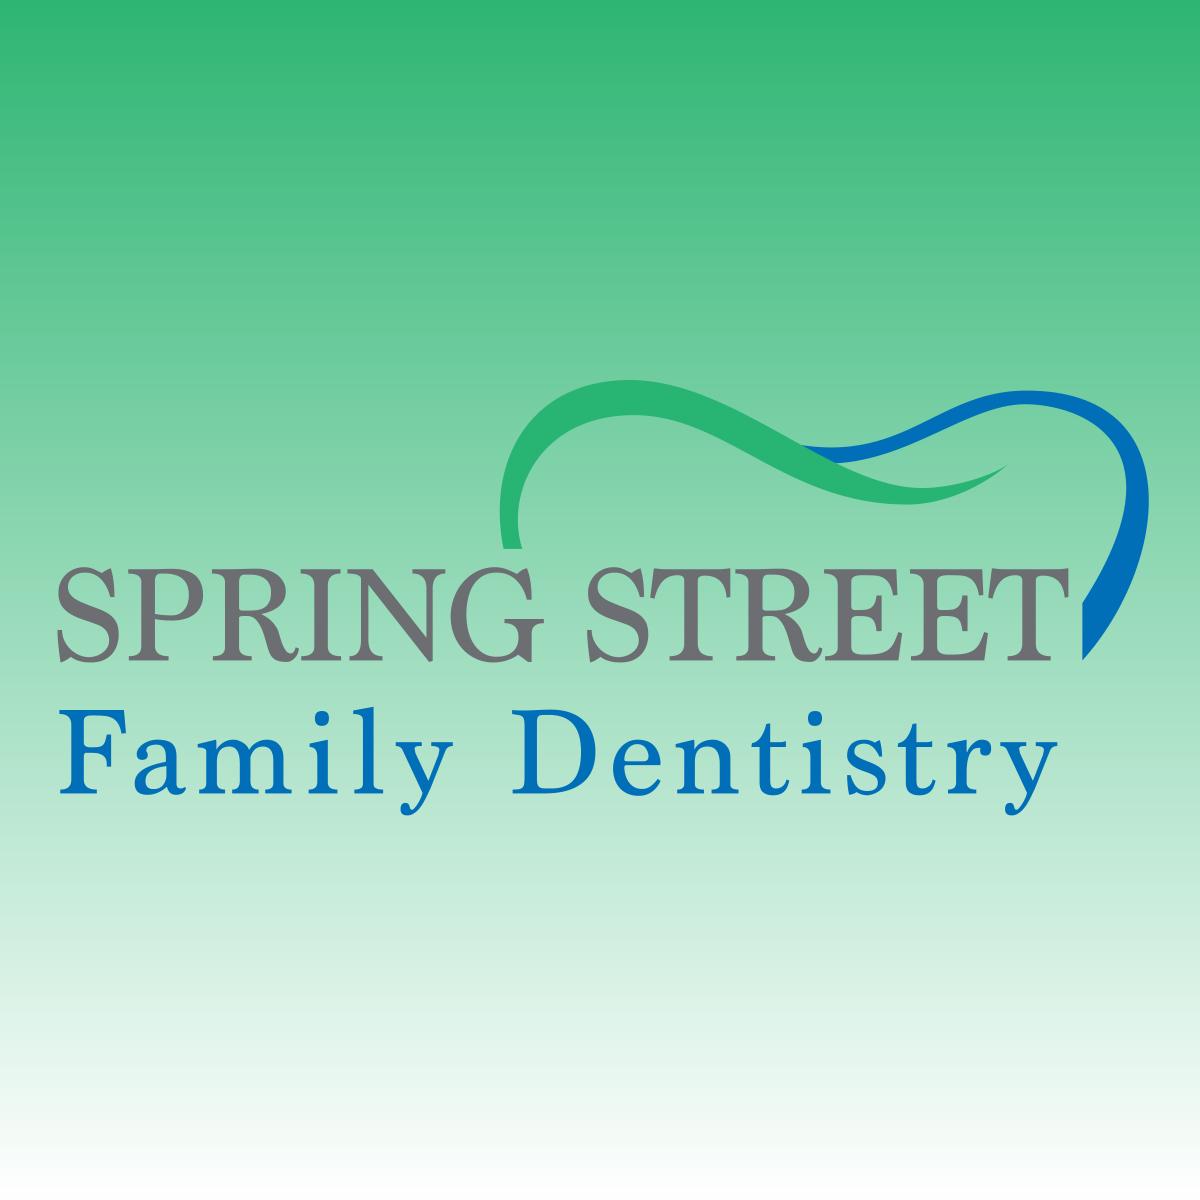 Spring Street Family Dentistry